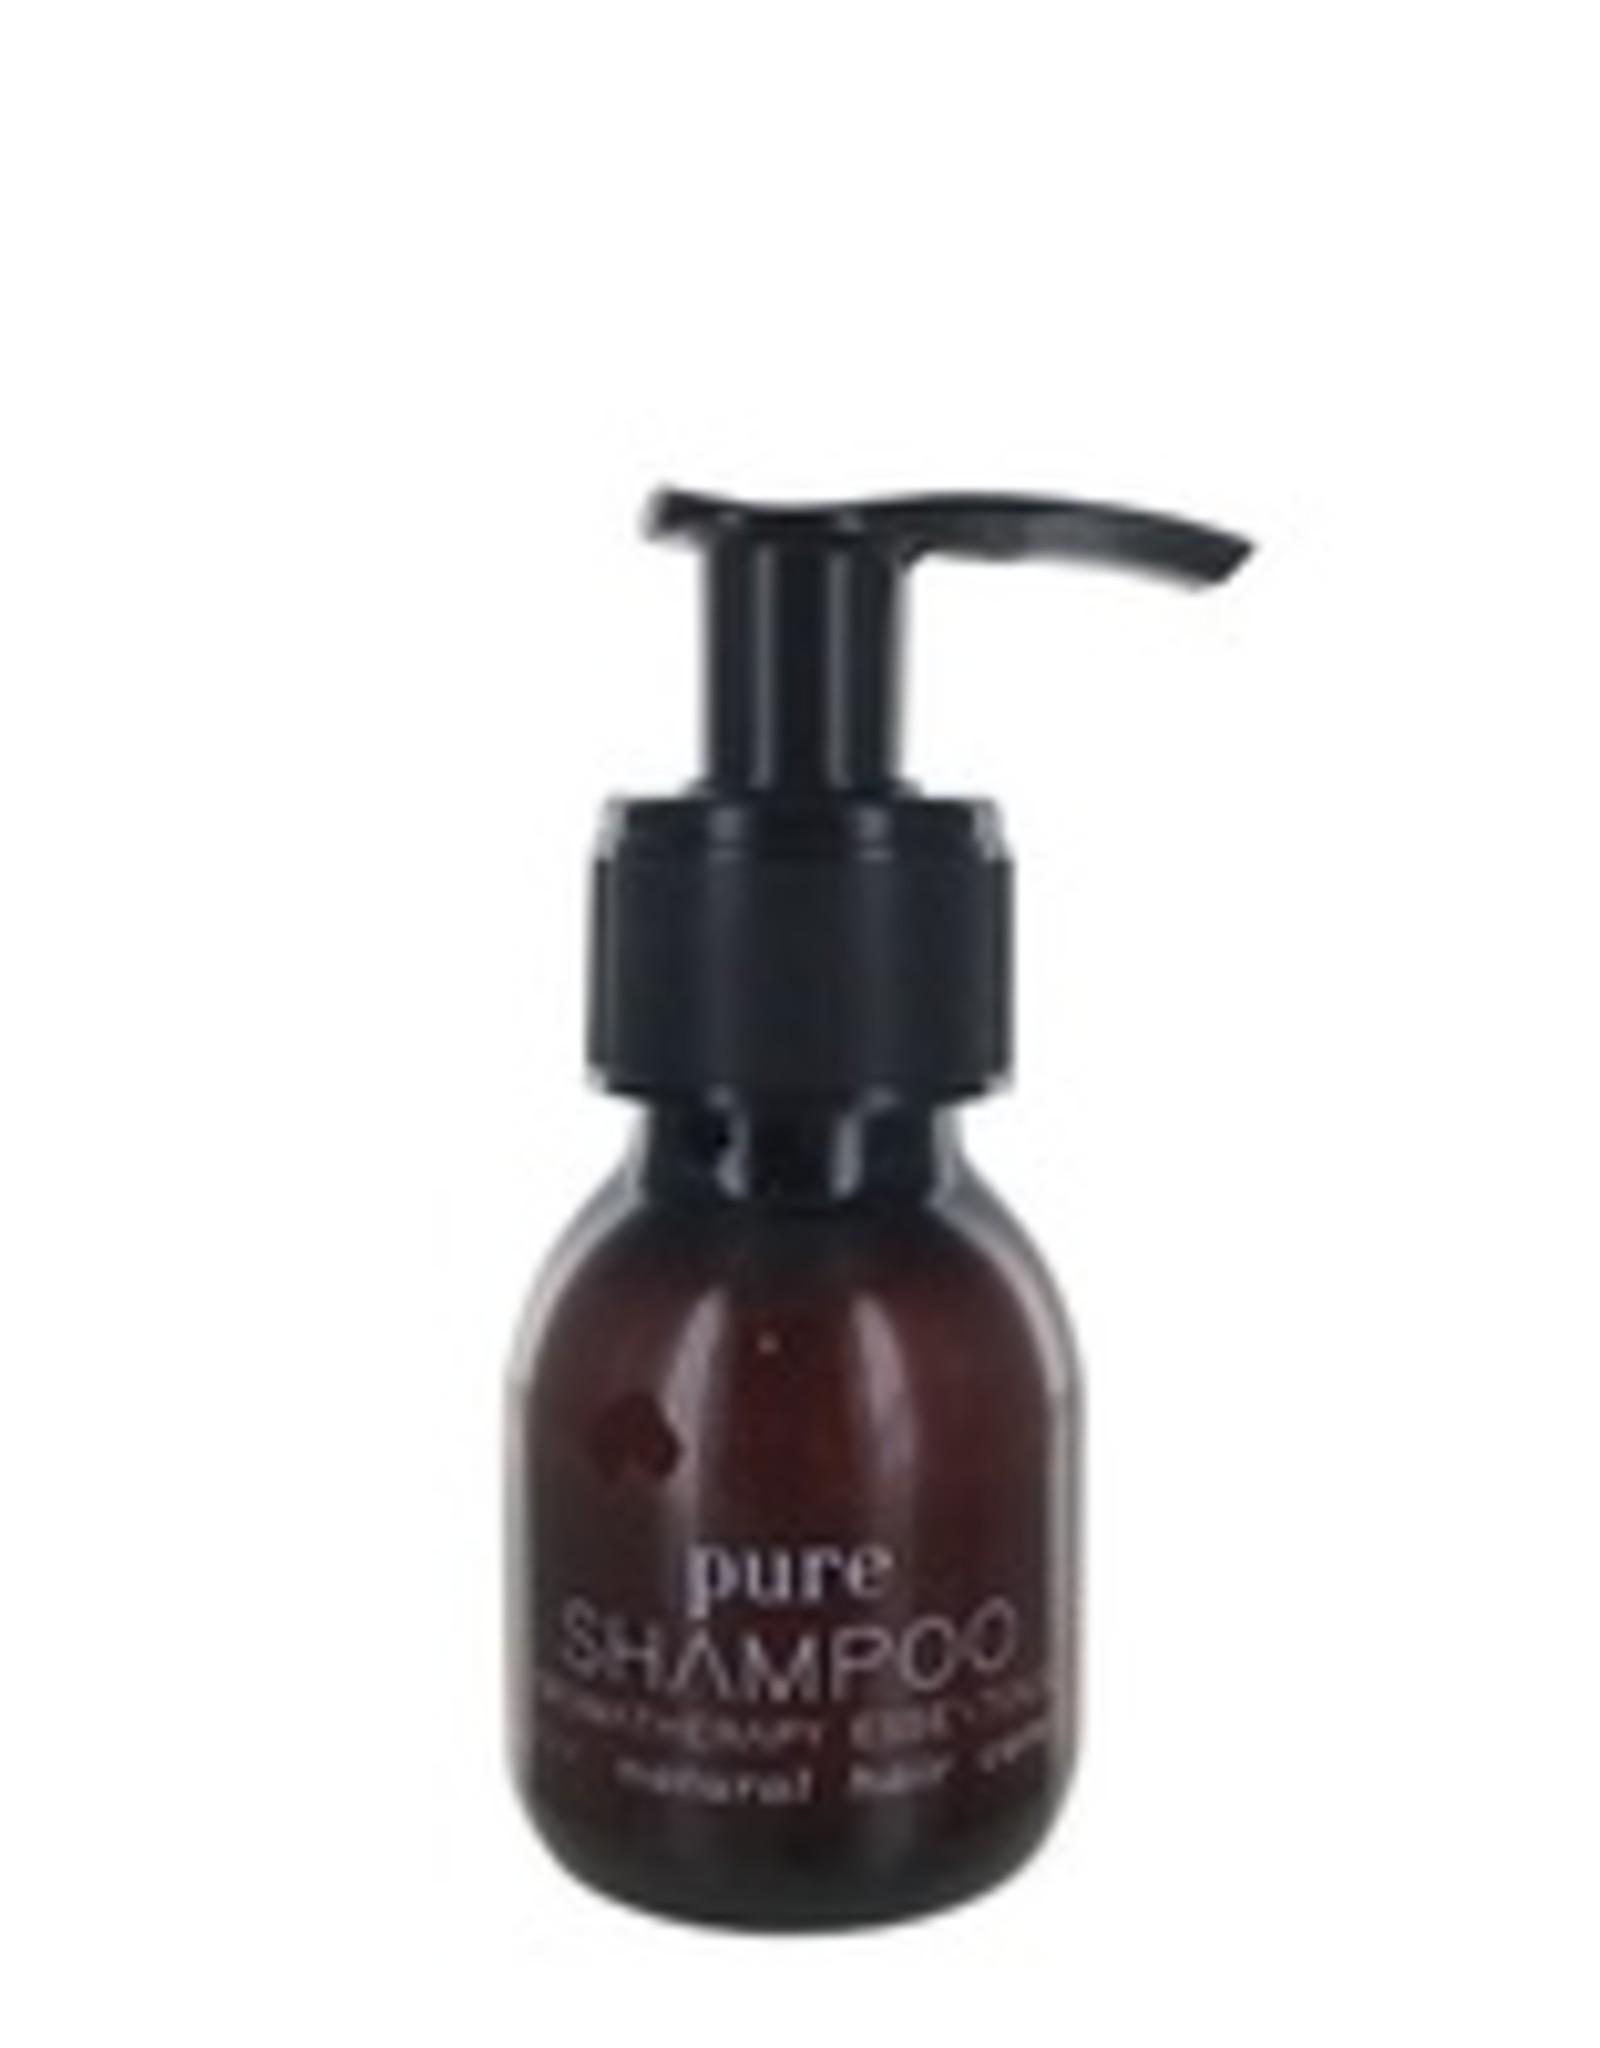 RainPharma TRAVEL - Pure Shampoo 60ml  - Rainpharma